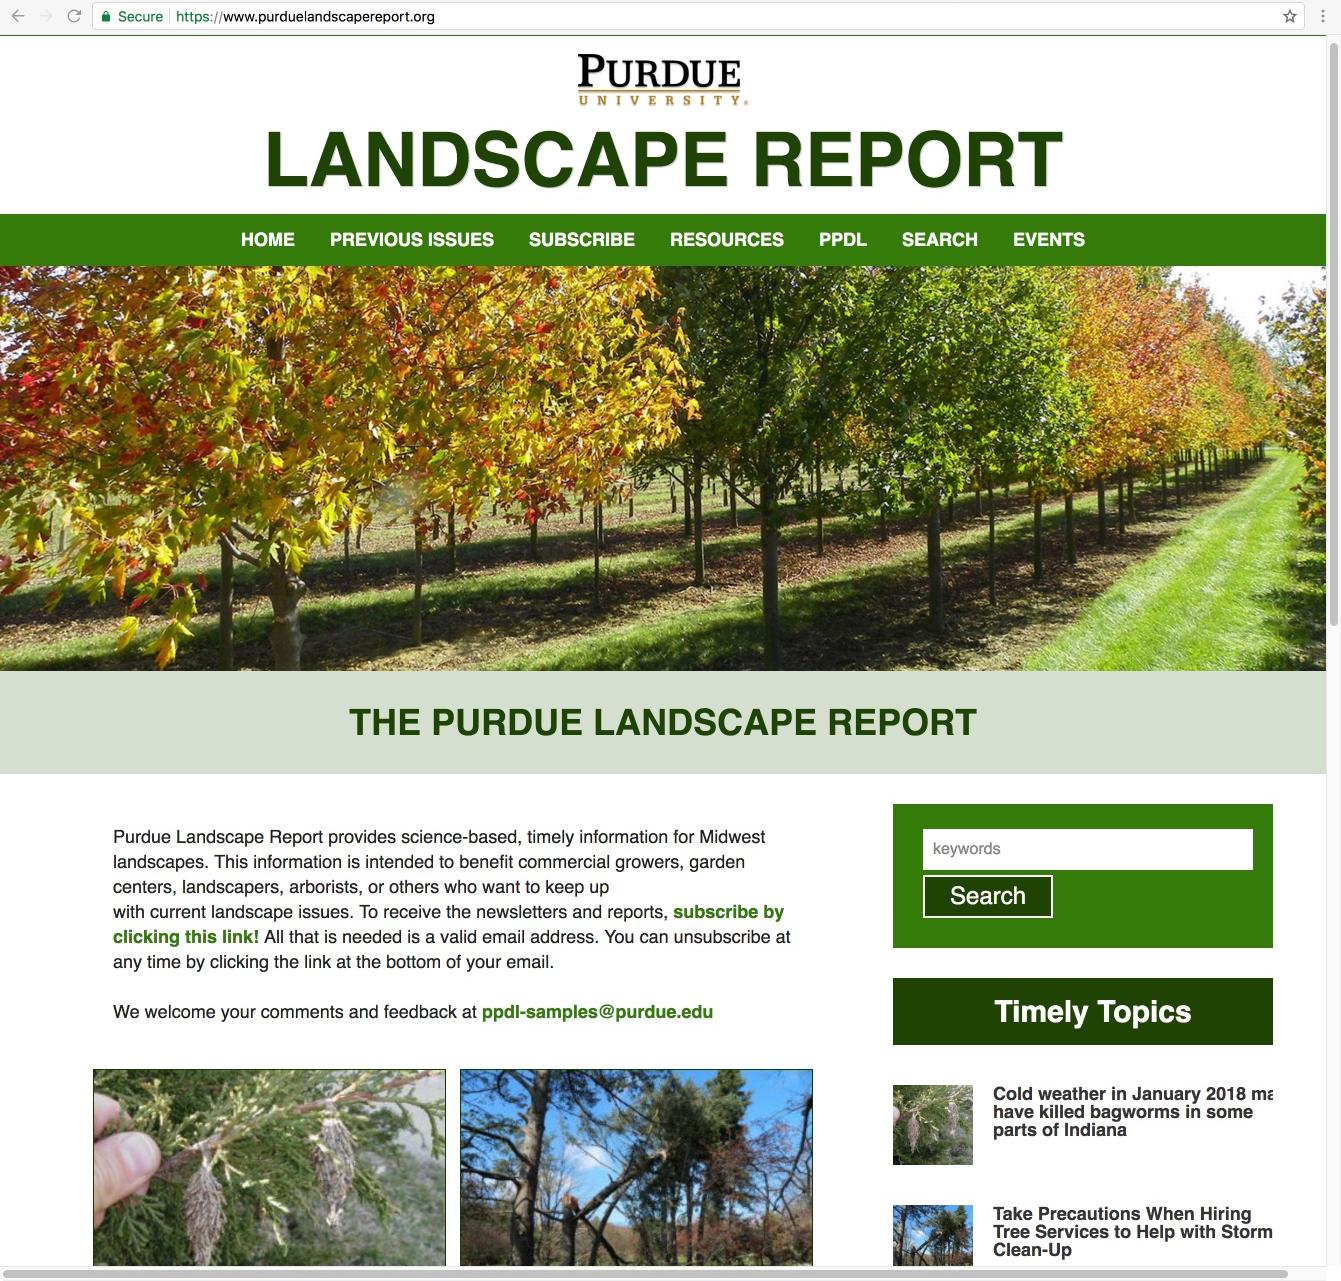 Partial Screen Shot Of The Purdue Landscape Report Web Page